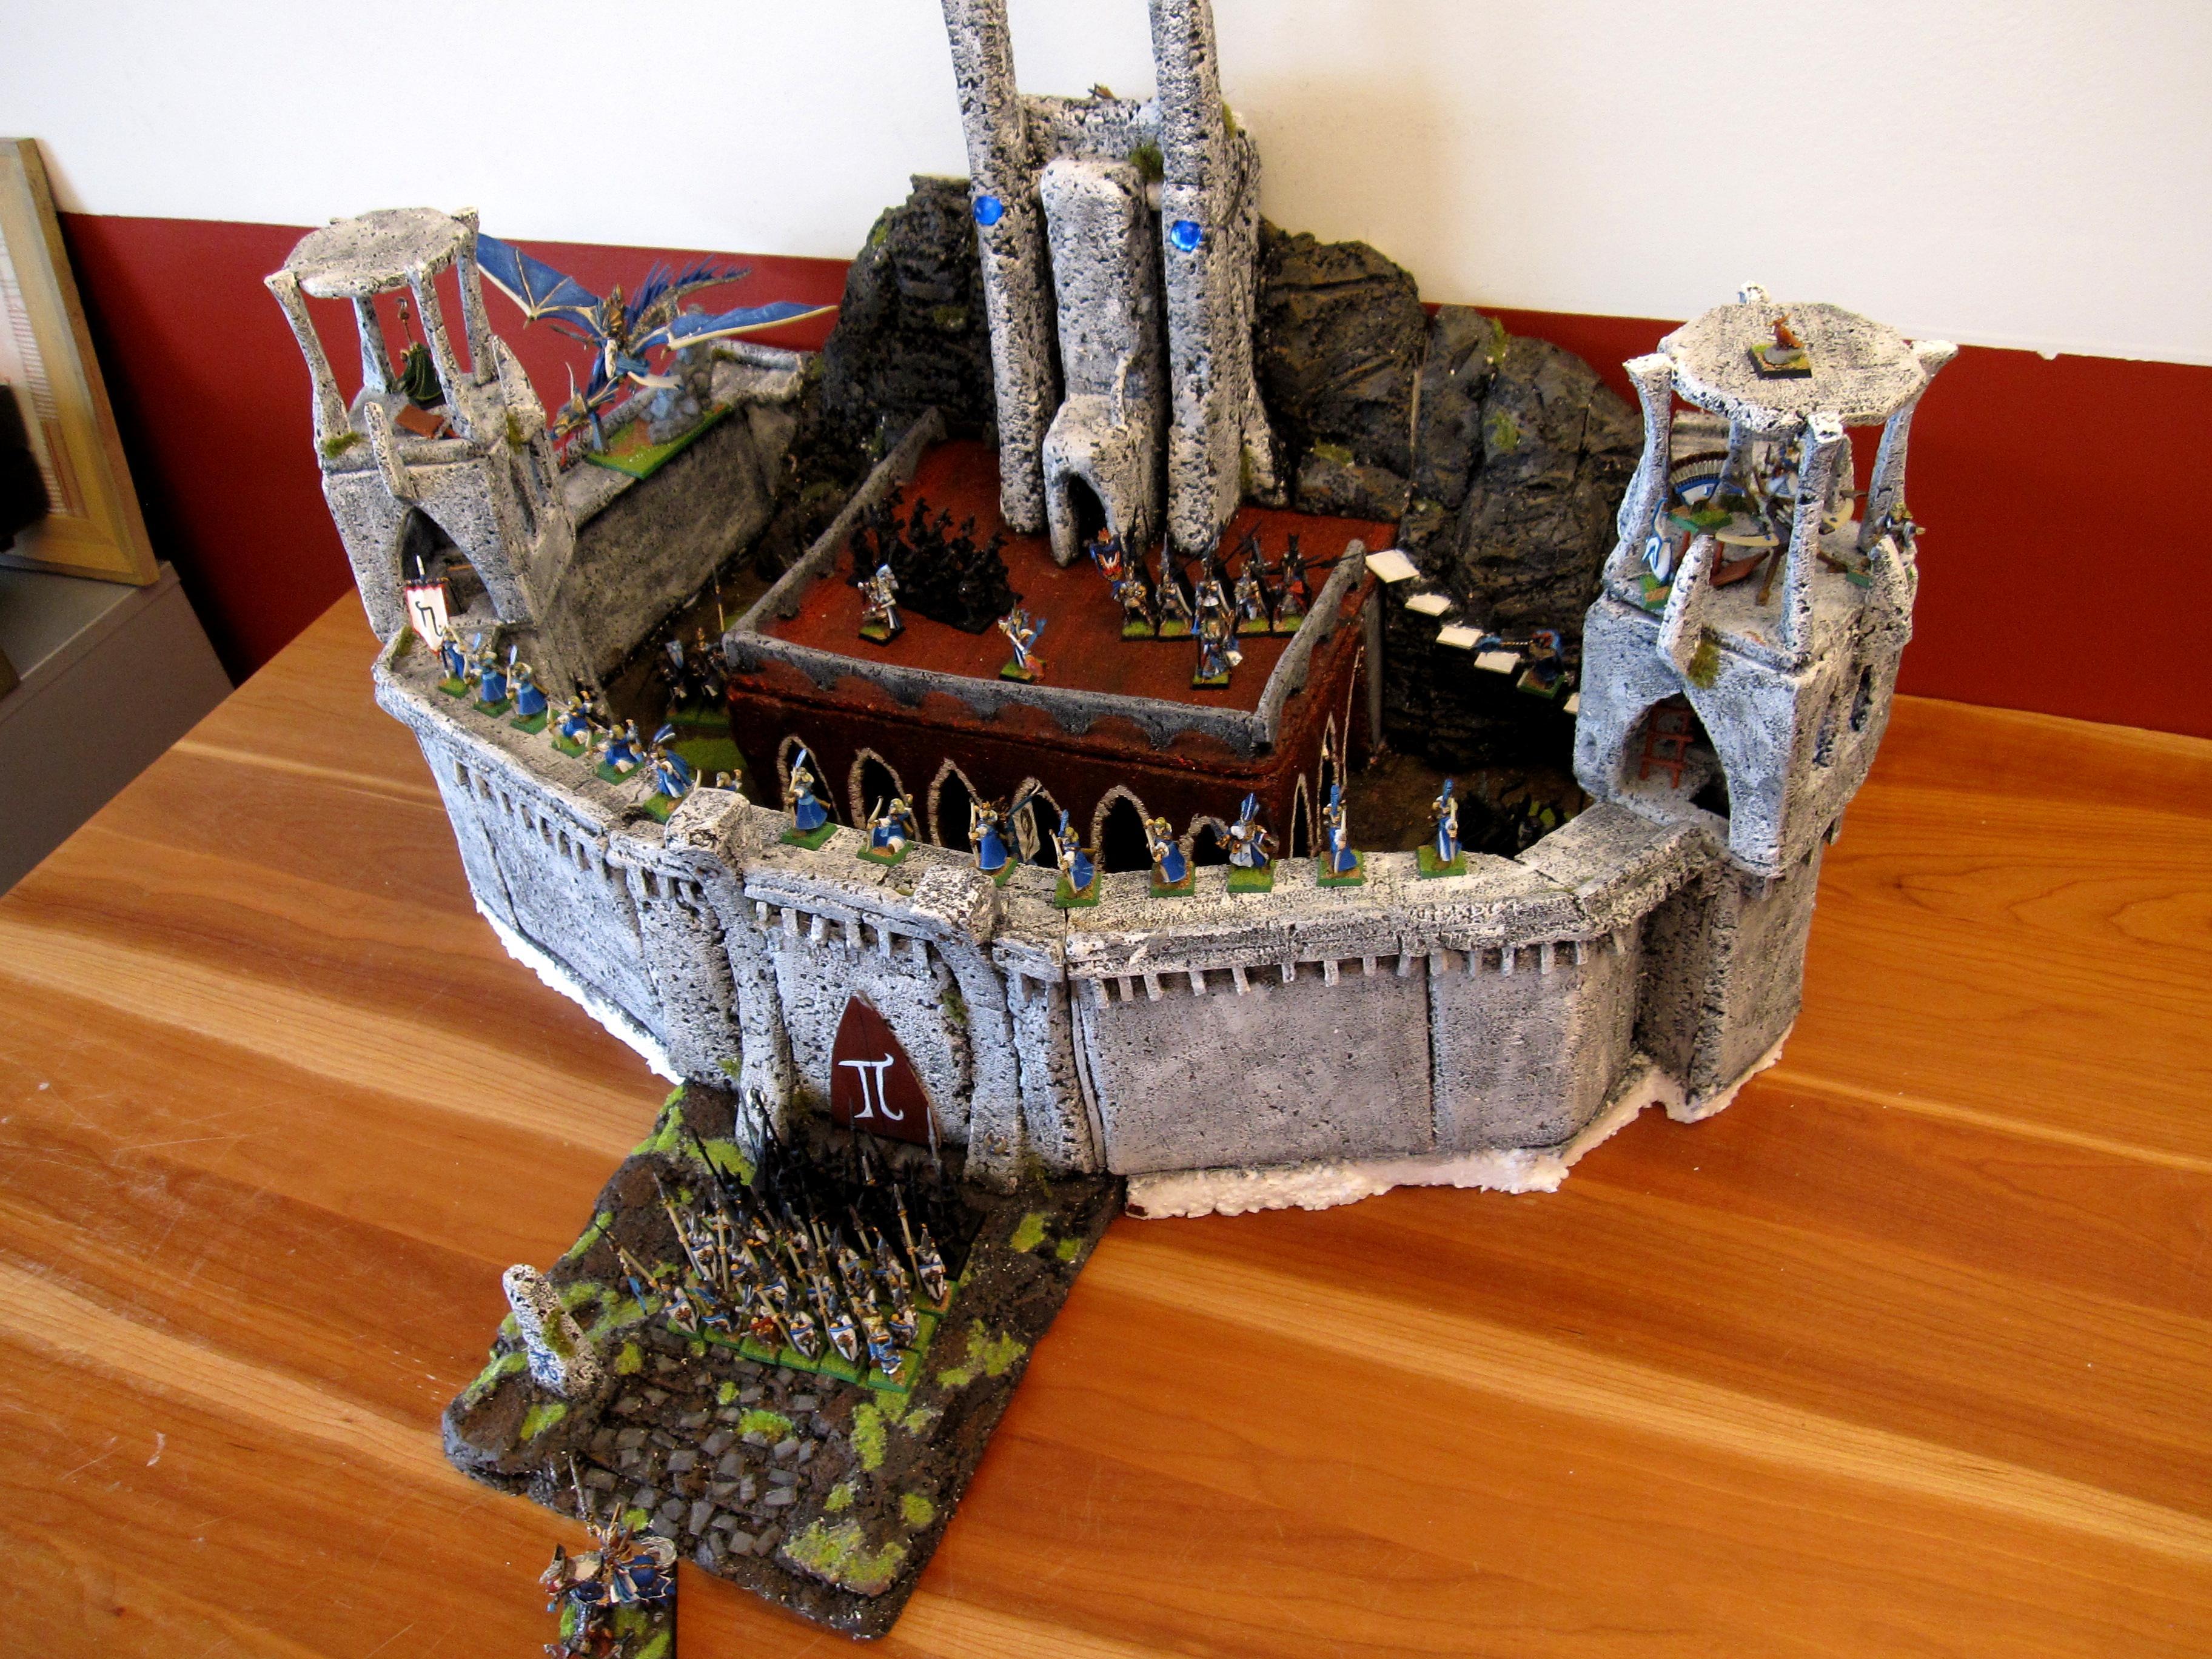 Bladelord, Buildings, Castle, Catle, Elves, Fortress, Grey Knights, Griffon, High Elves, Iob, Island Of Blood, Kalaer, Lava, Styrofoam, Terminator Armor